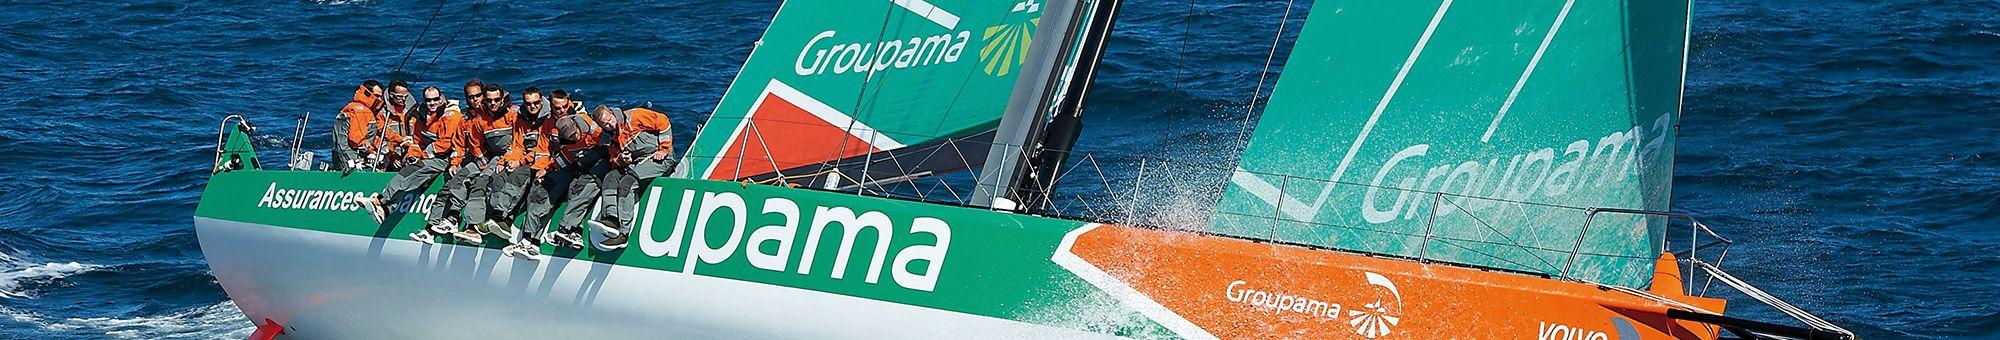 WILLIAMSON ELECTRONIQUE partenaire de Groupama sailing team